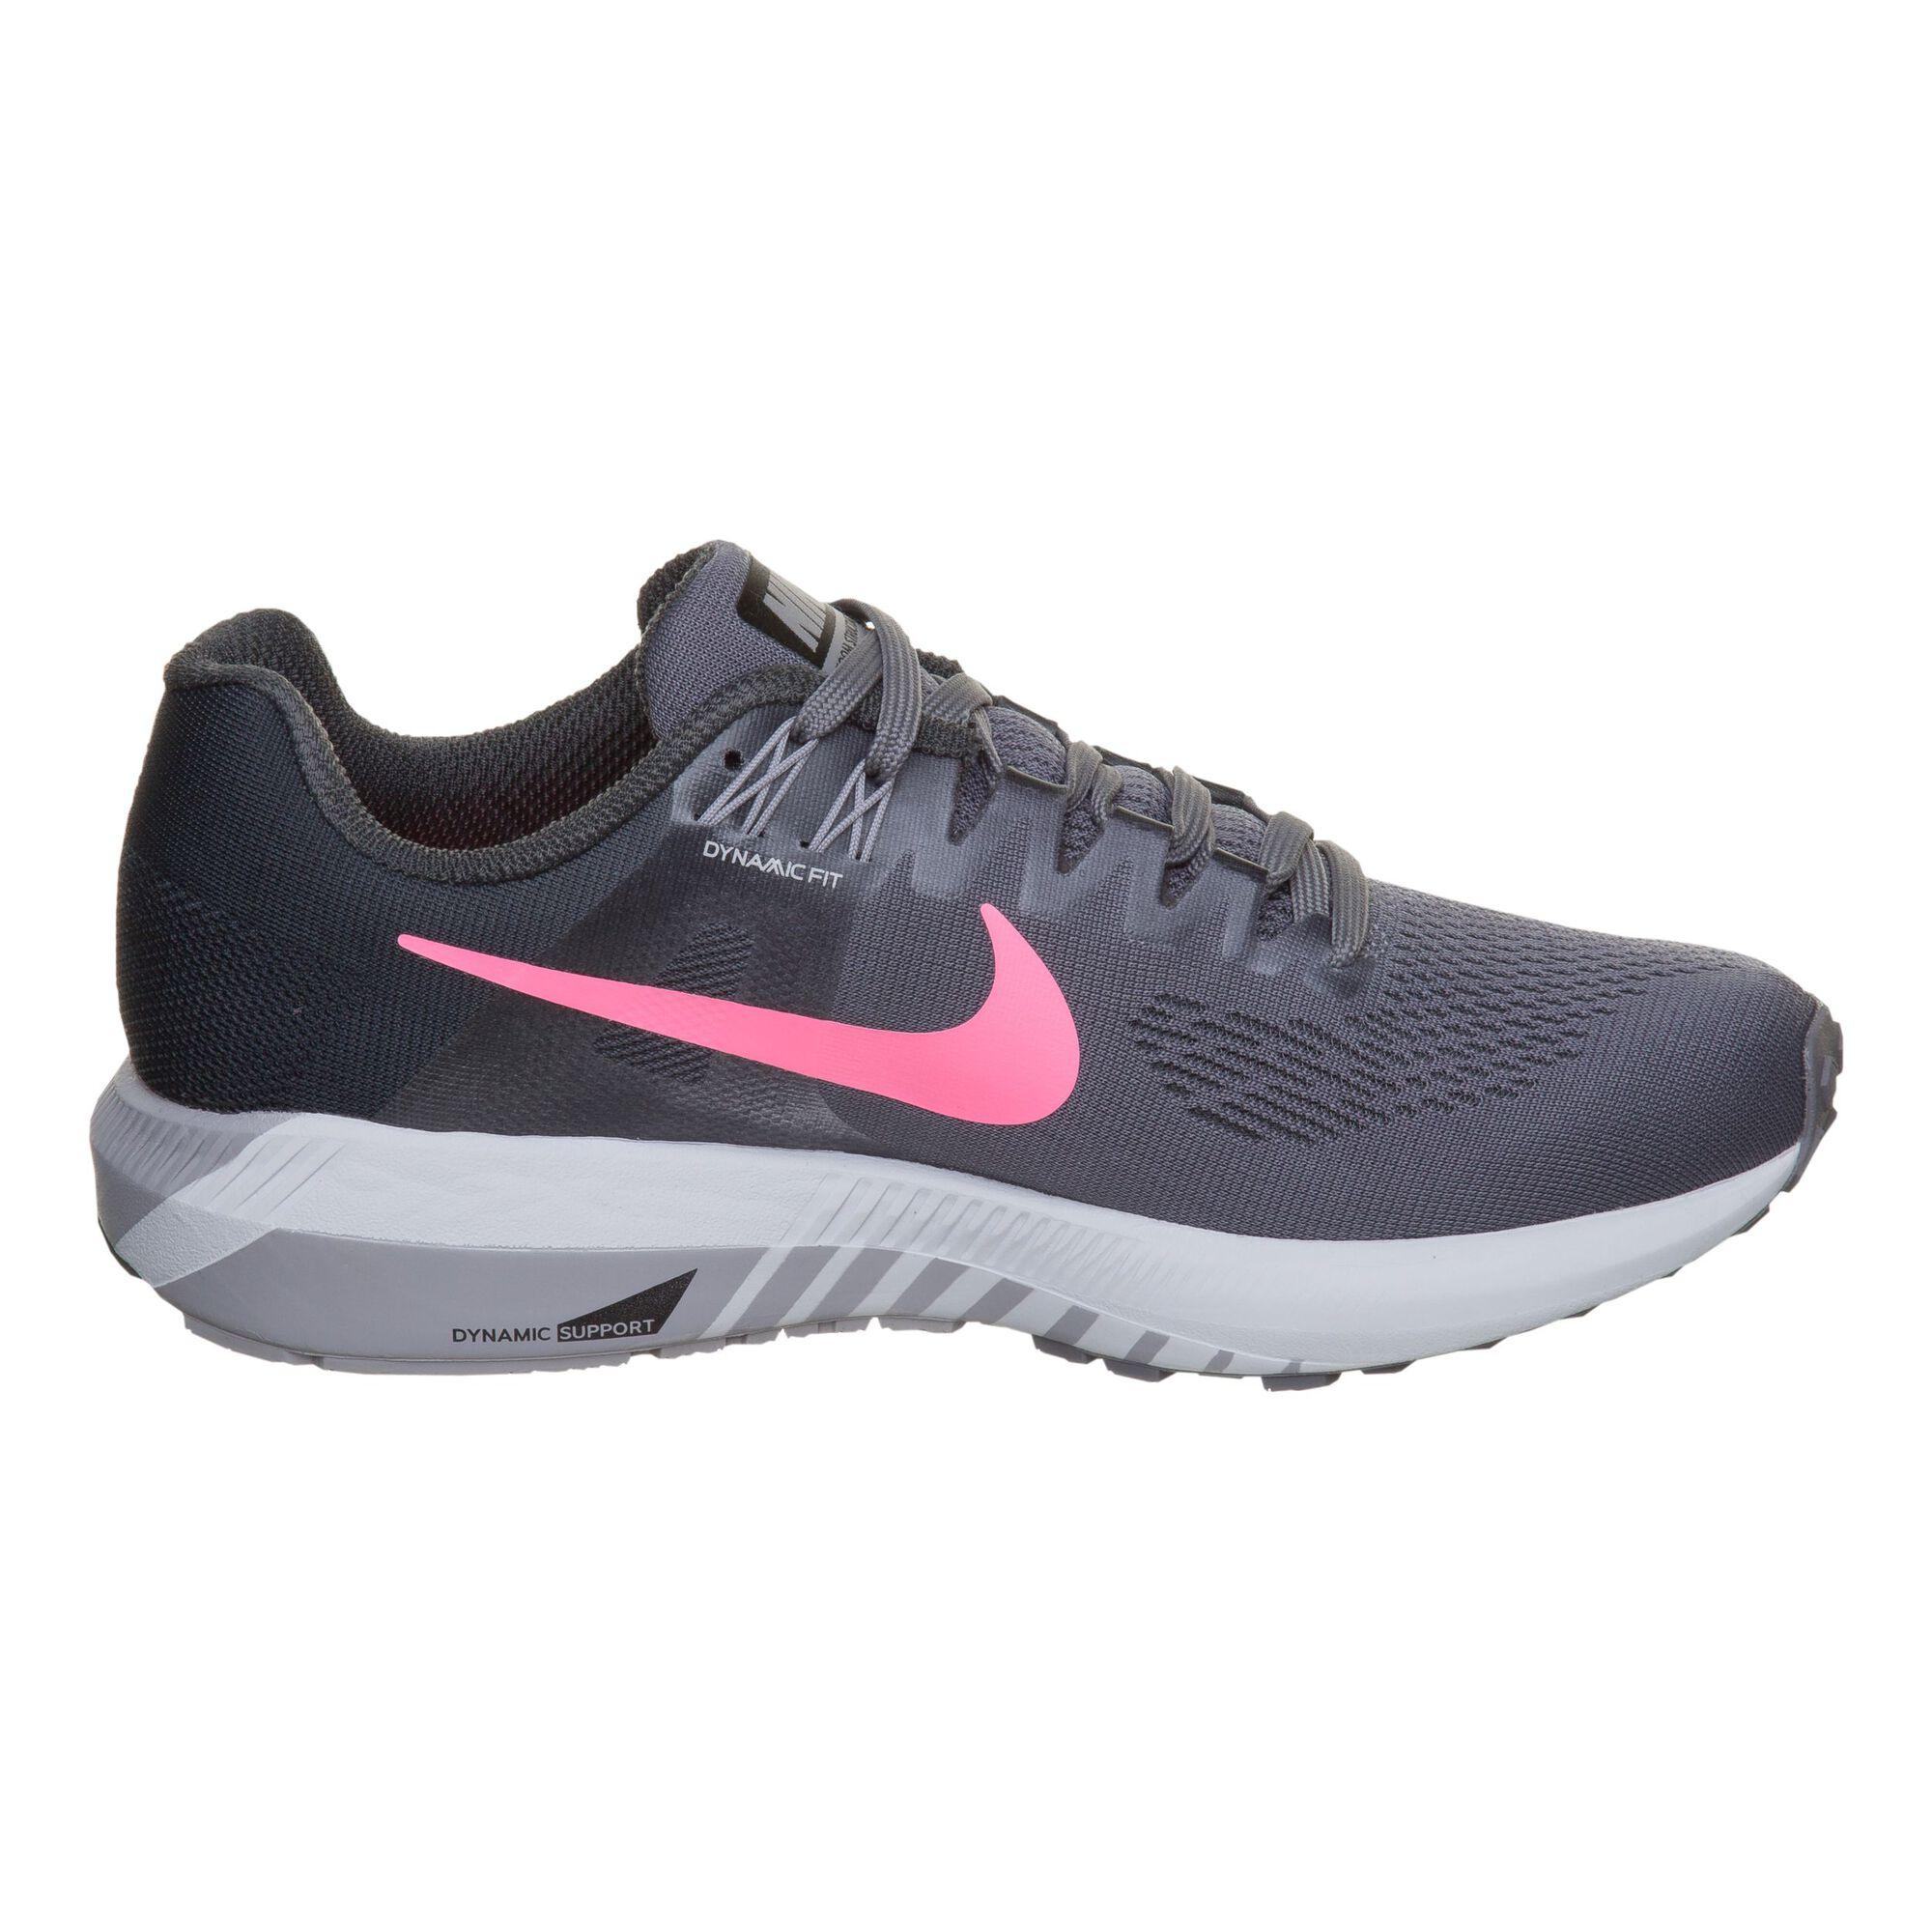 2610454be440f Nike  Nike  Nike  Nike  Nike  Nike  Nike  Nike  Nike  Nike. Air Zoom  Structure 21 Running Shoe Women ...